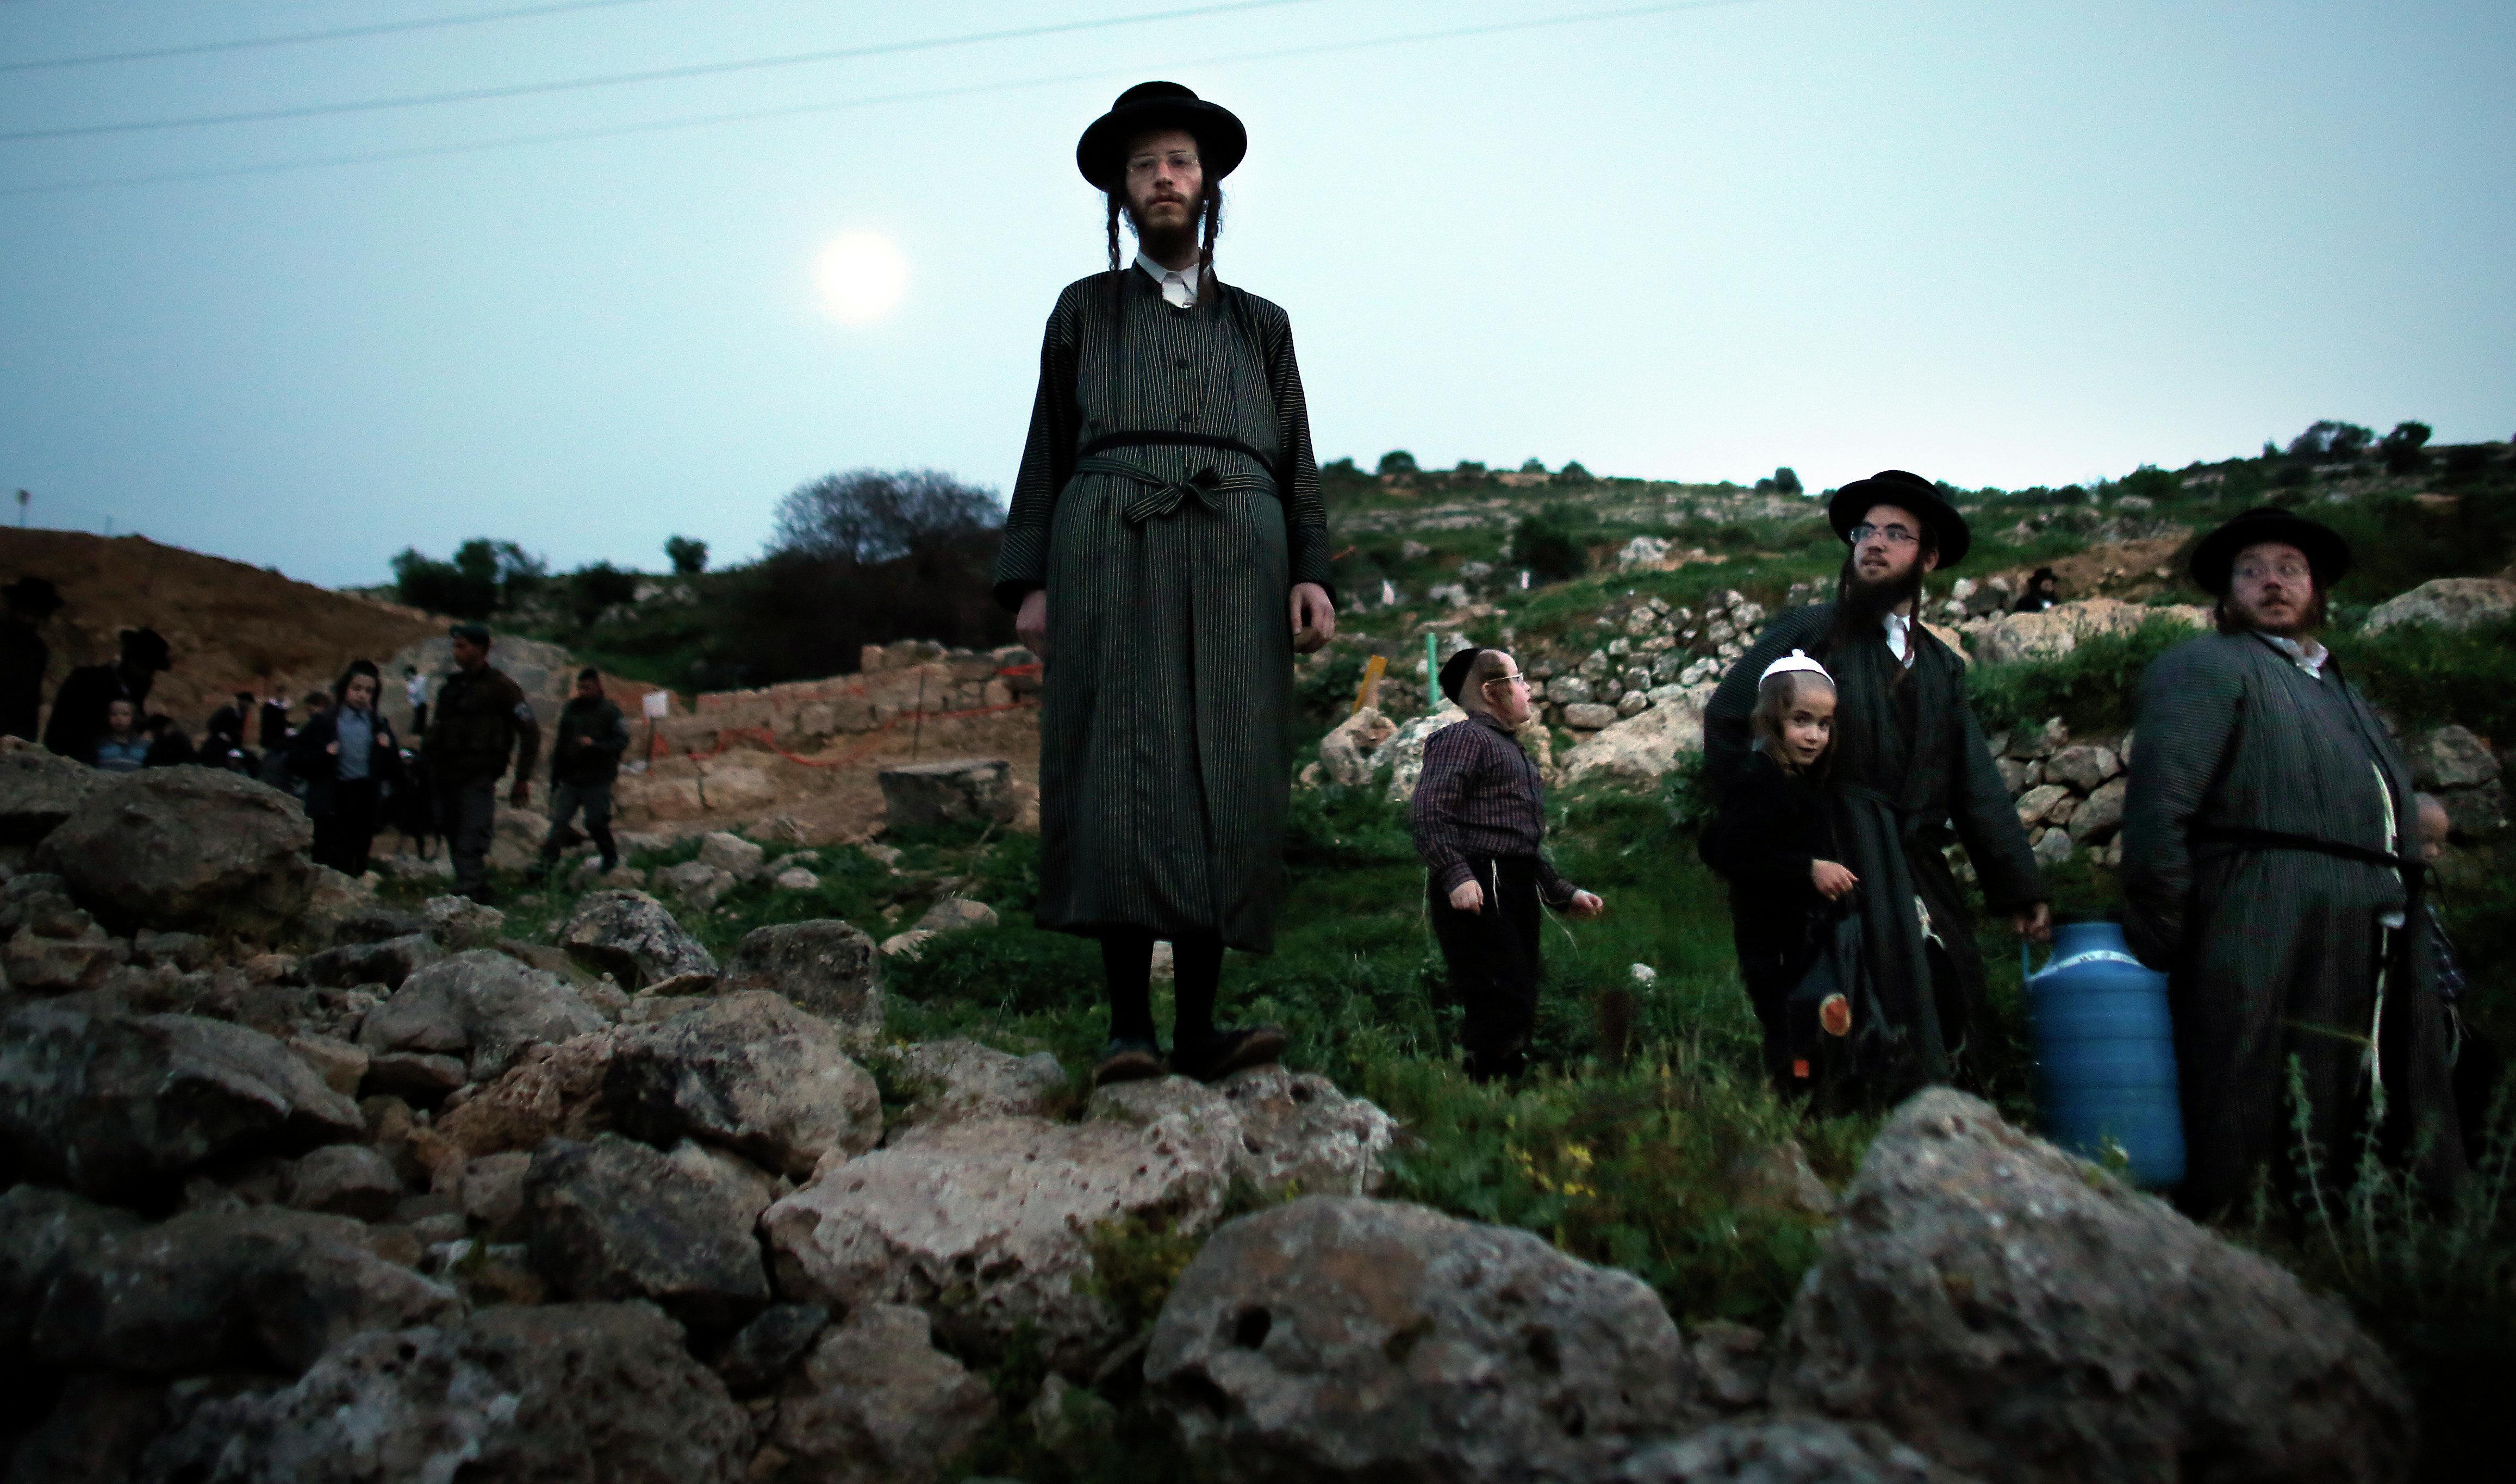 Des Juifs en terre d'Israël